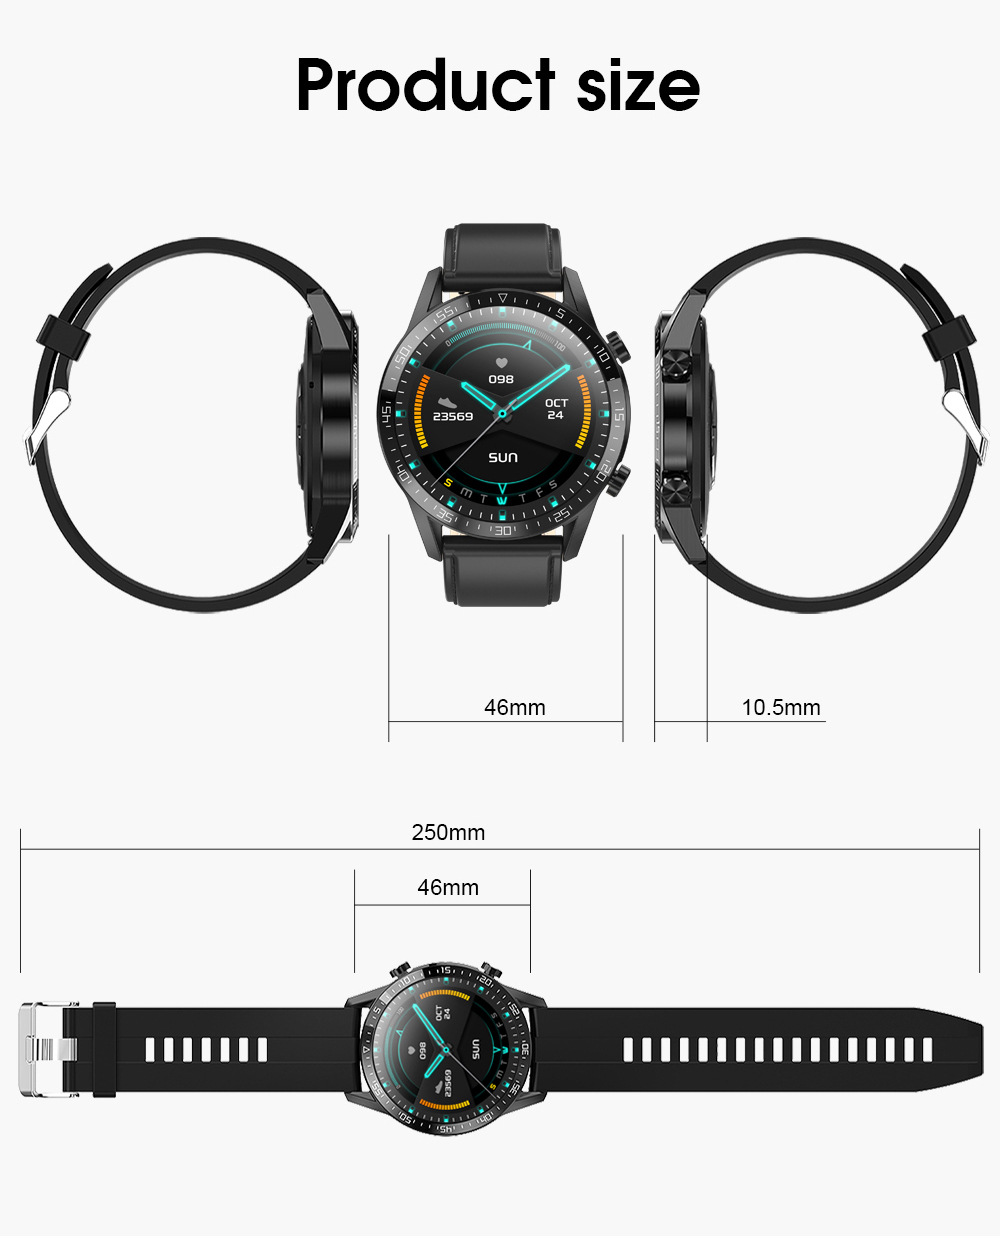 Hbc85c350b4344494bb3439c1cdd0c985l IPbzhe Smart Watch Men Thermometer ECG Smart Watch IP68 Waterproof Blood Pressure Smartwatch Reloj Inteligente For Huawei Xiaomi